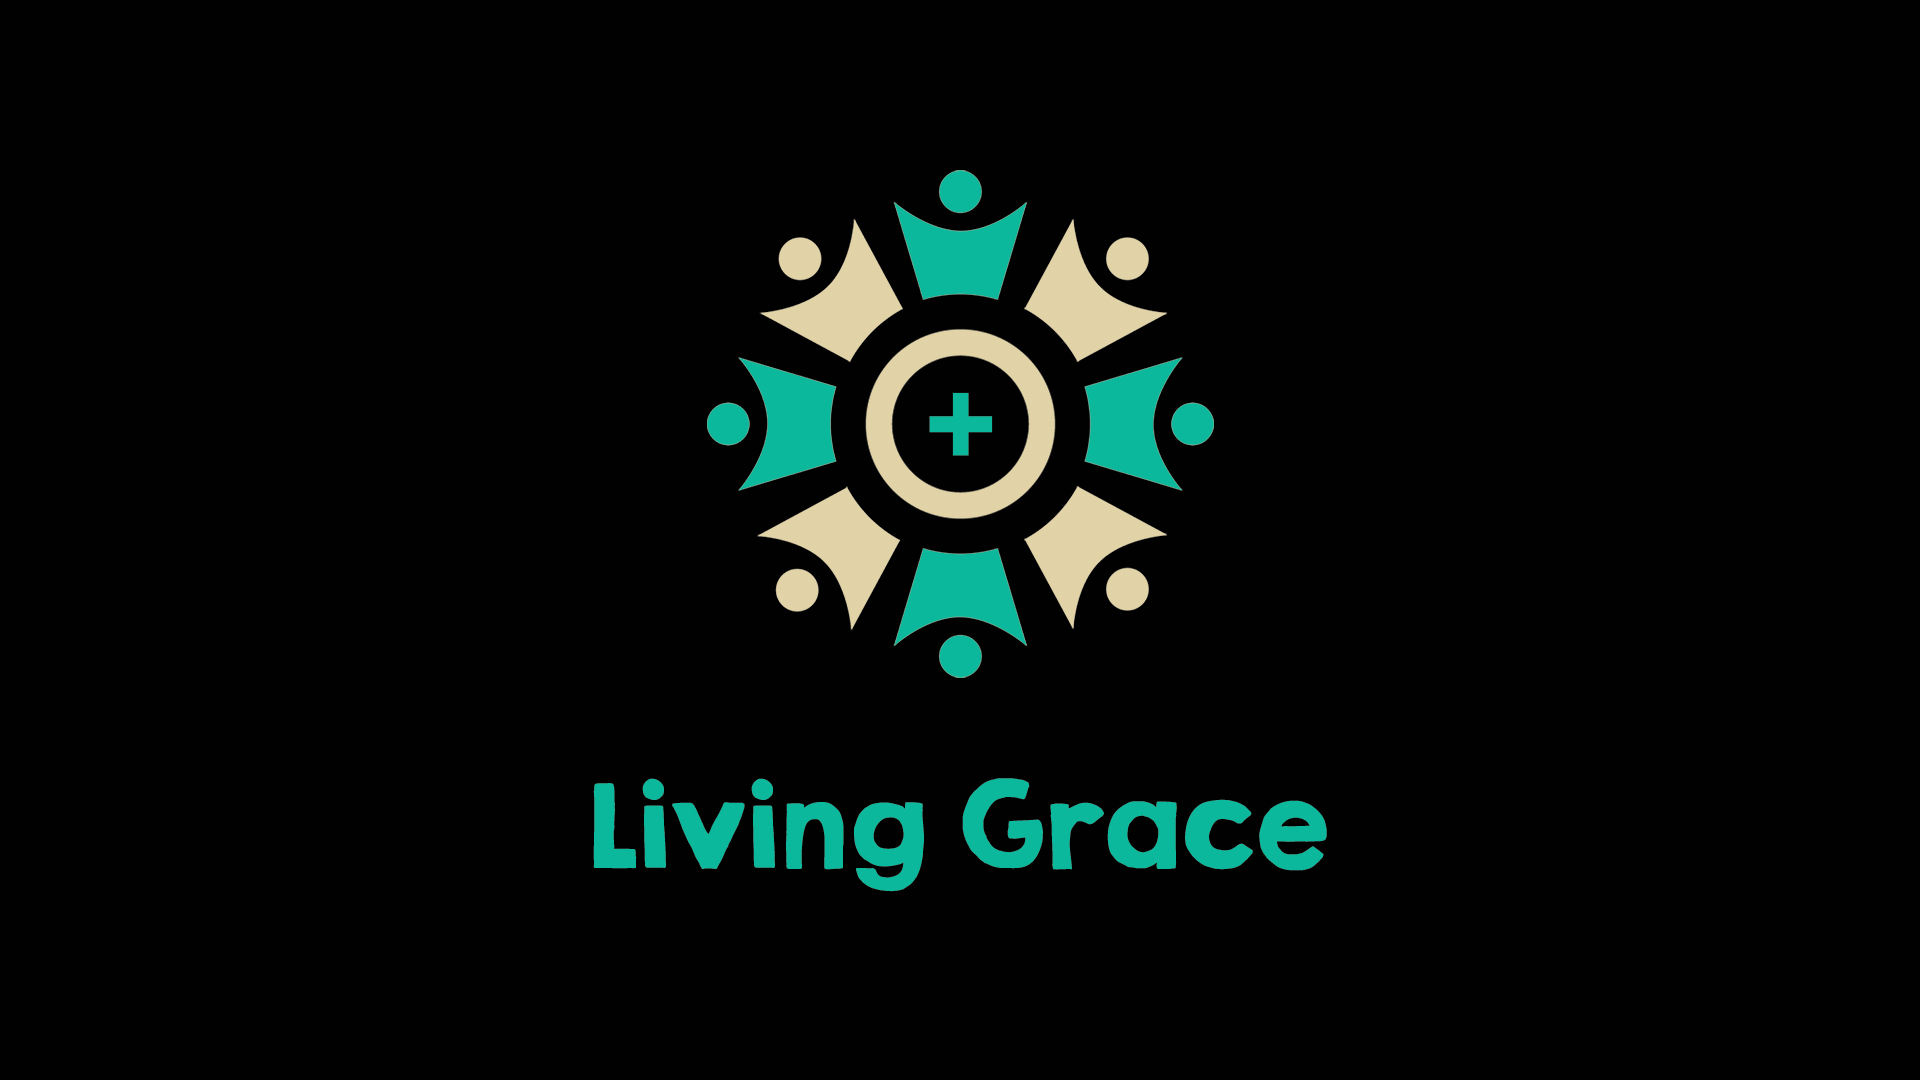 living-grace-sermons-image